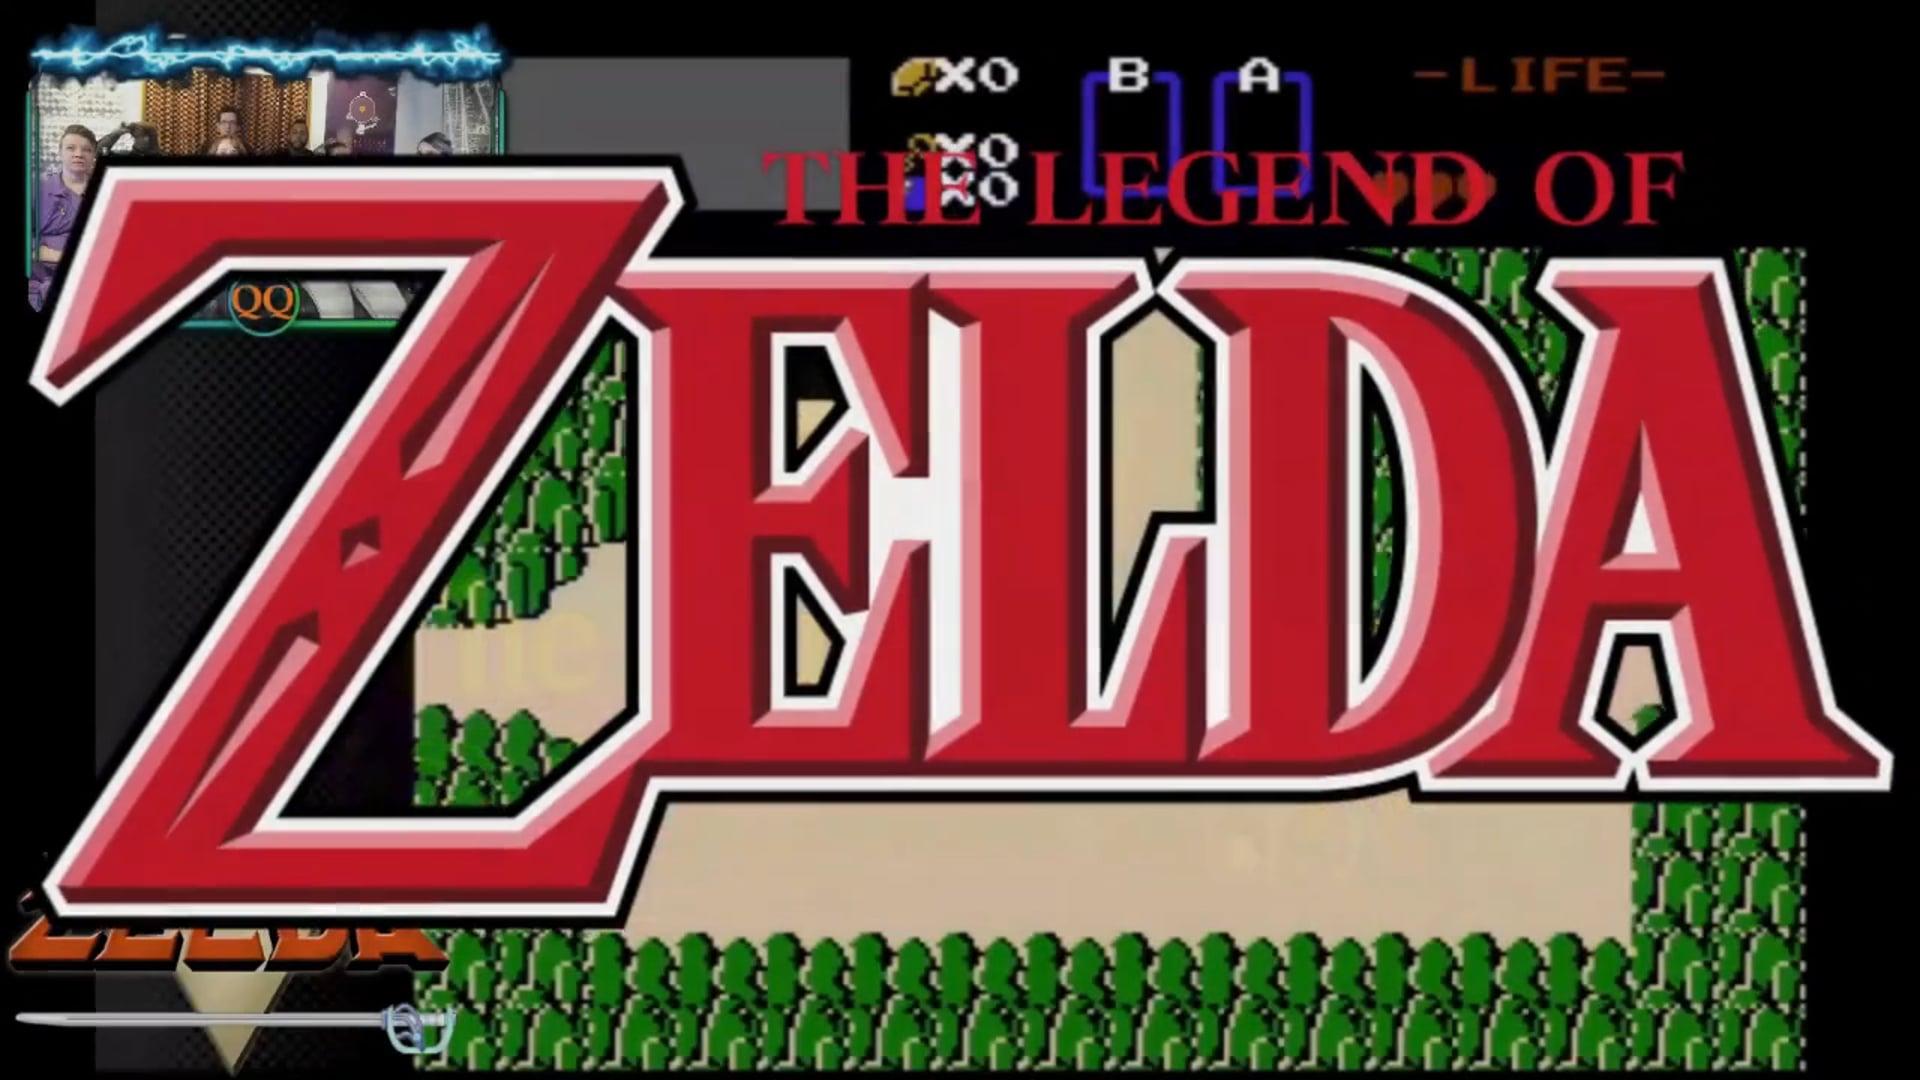 Legend of Zelda games pt.1